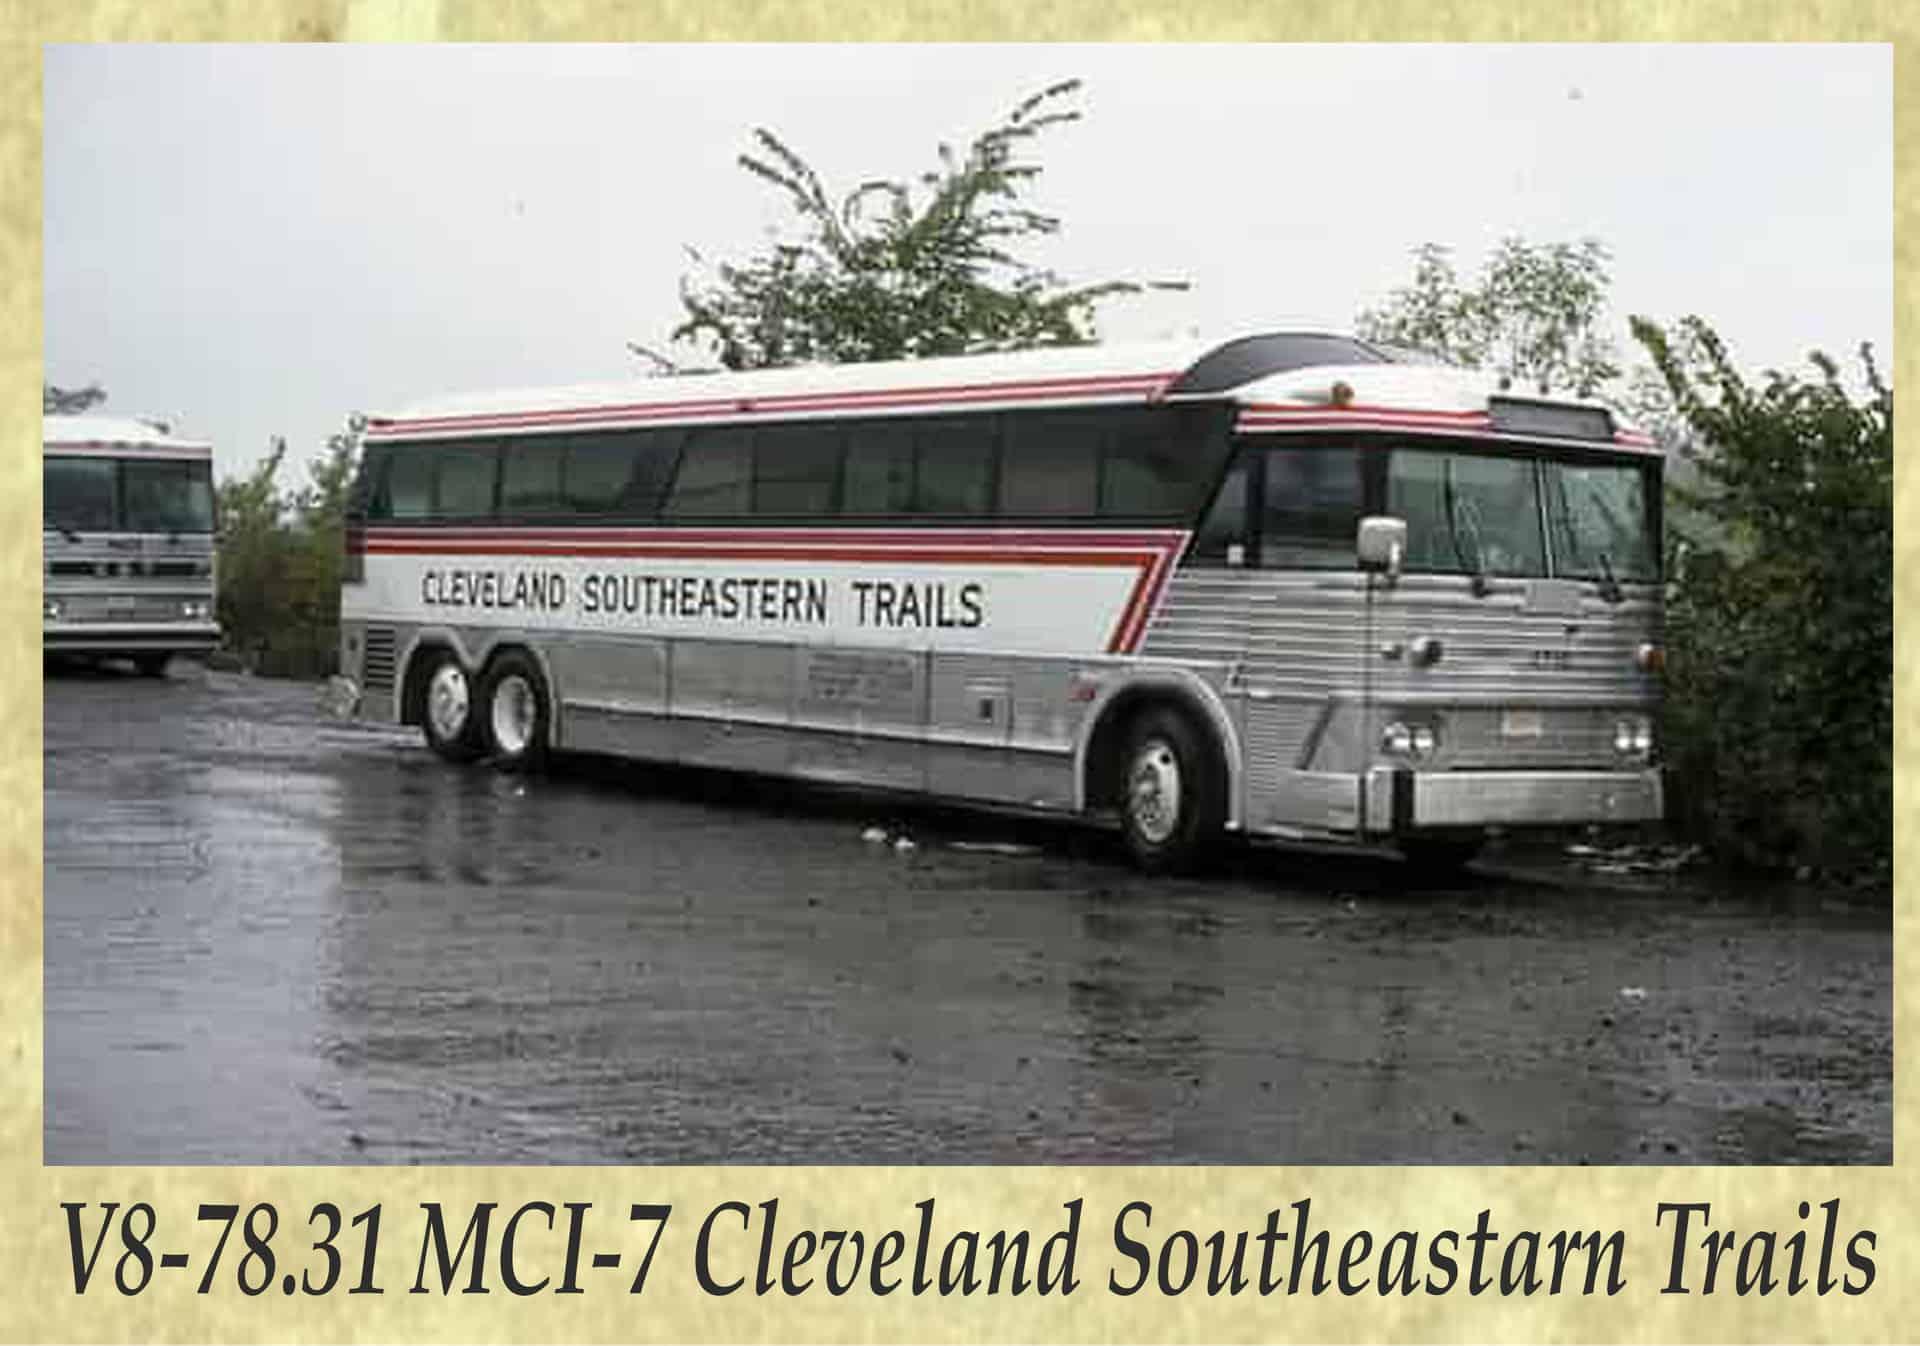 V8-78.31 MCI-7 Cleveland Southeastarn Trails